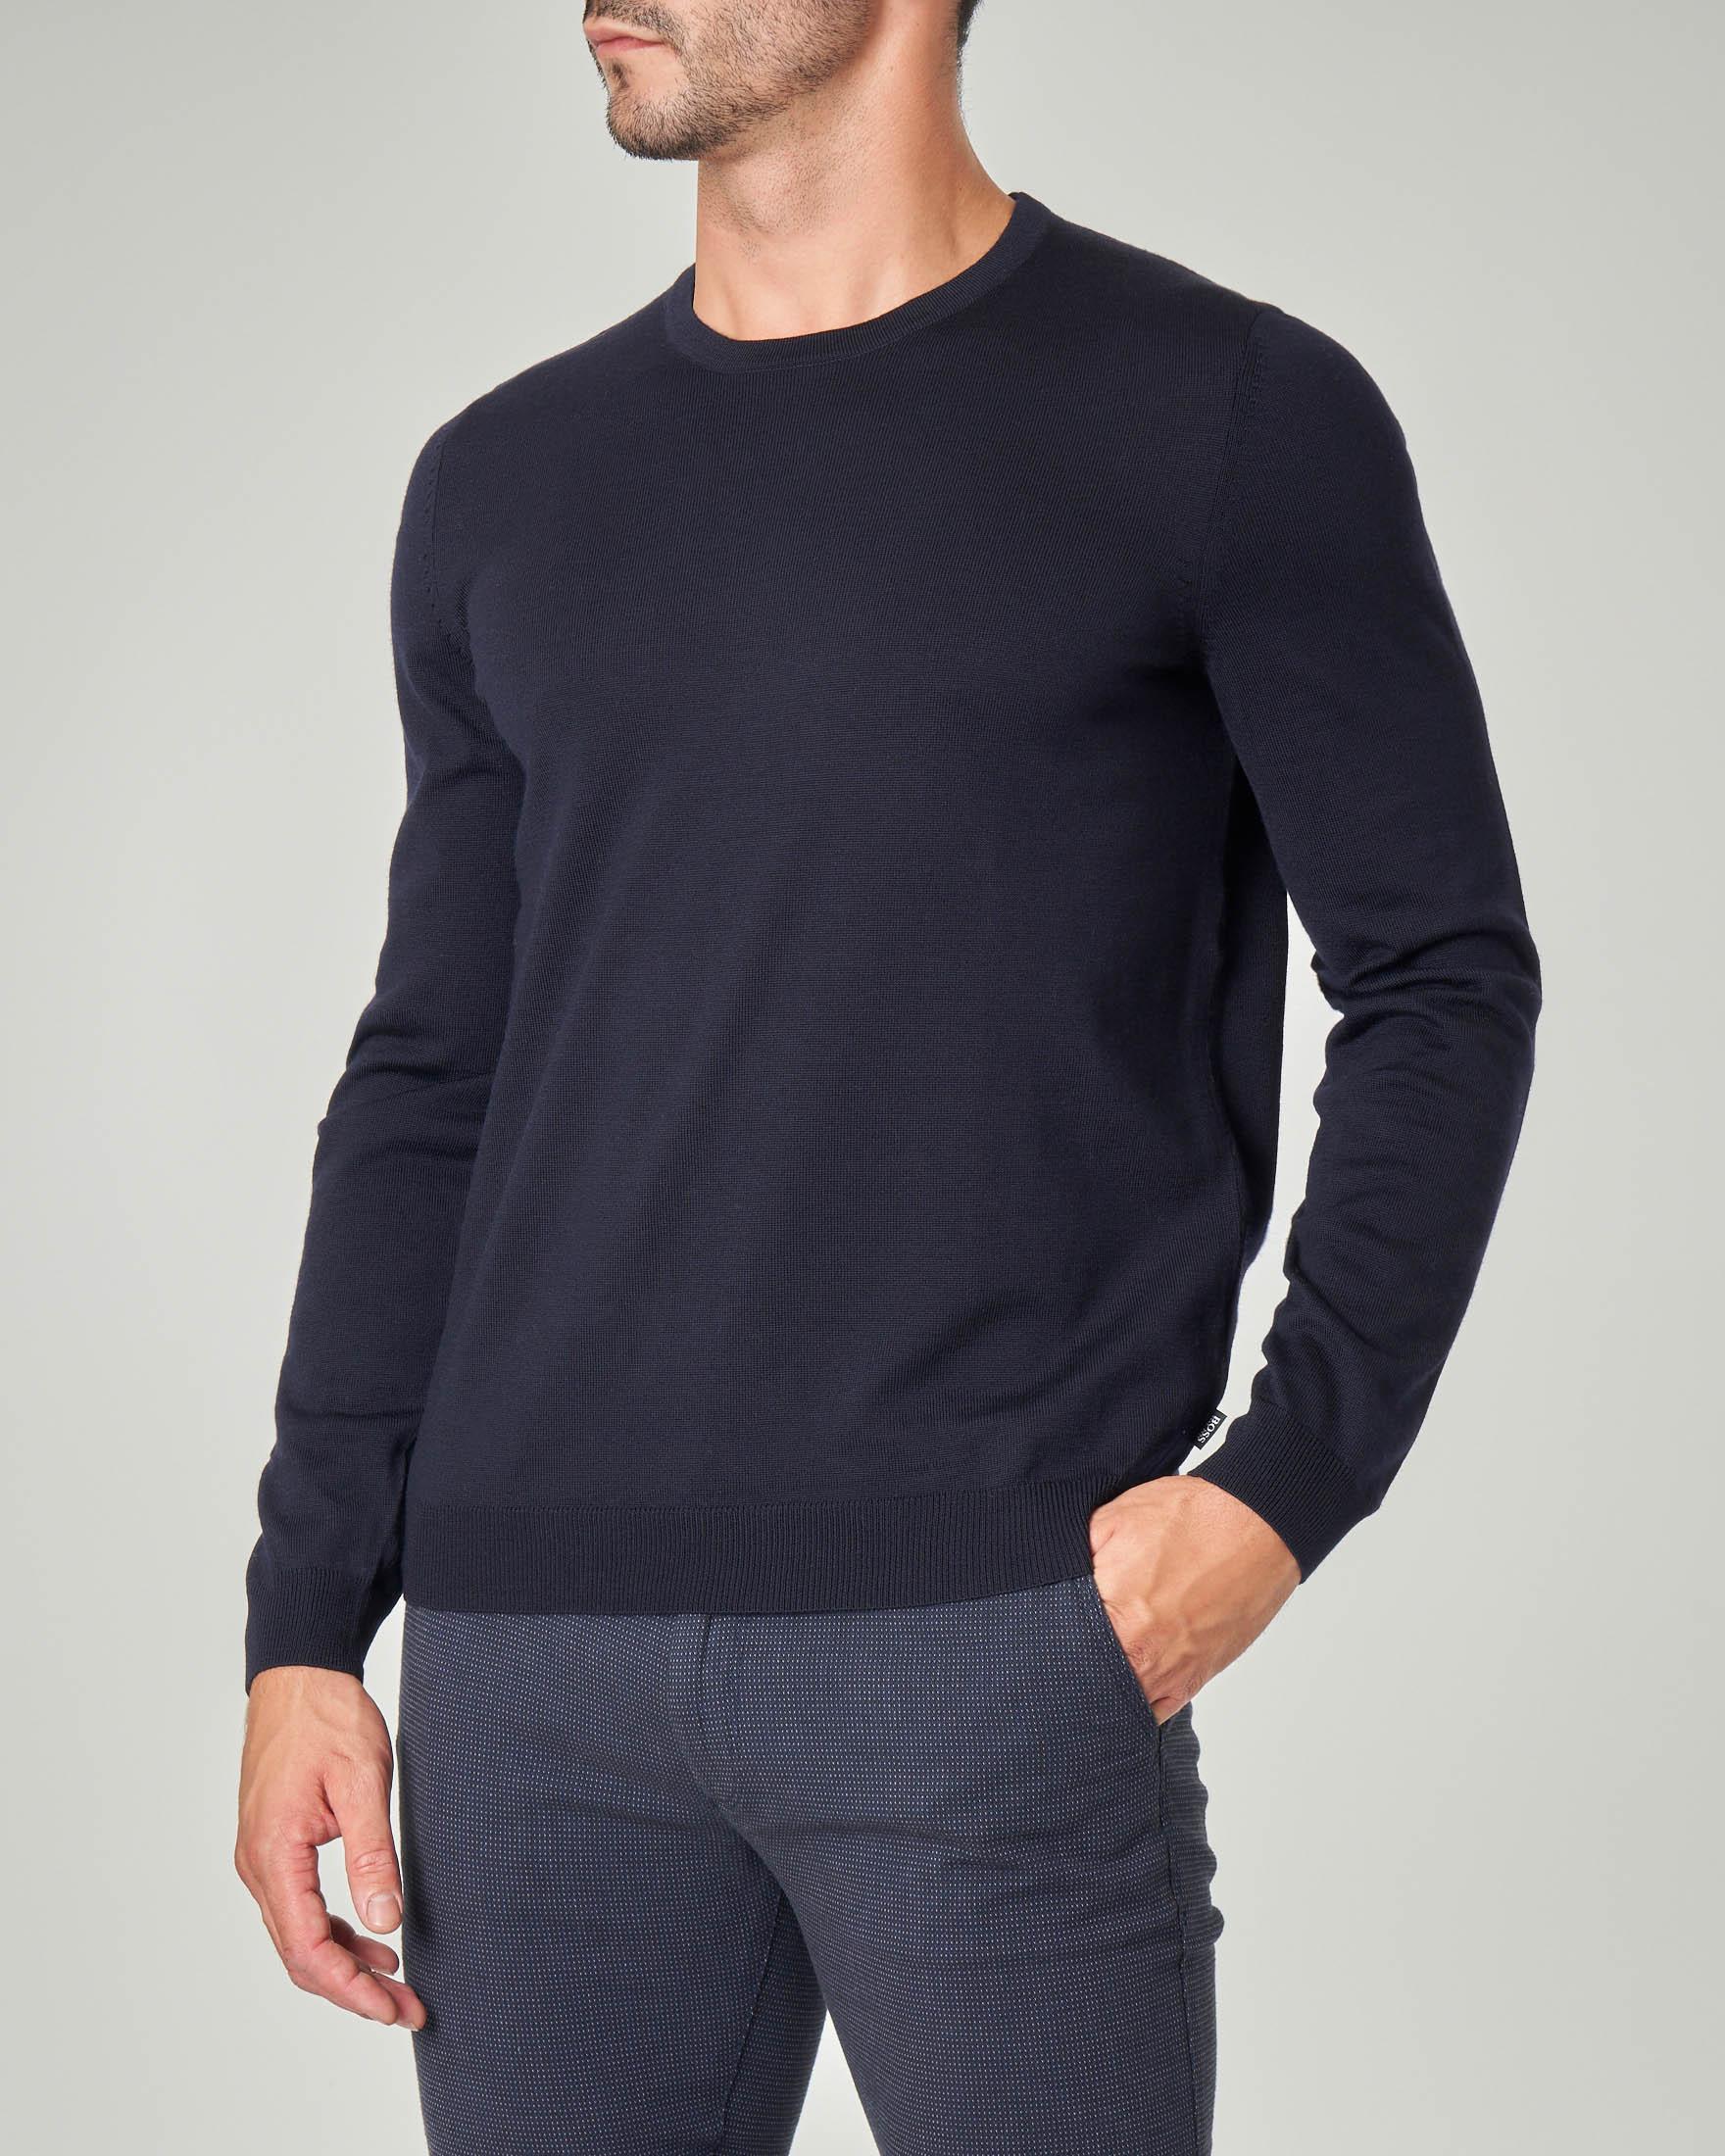 Maglia blu girocollo in lana merino